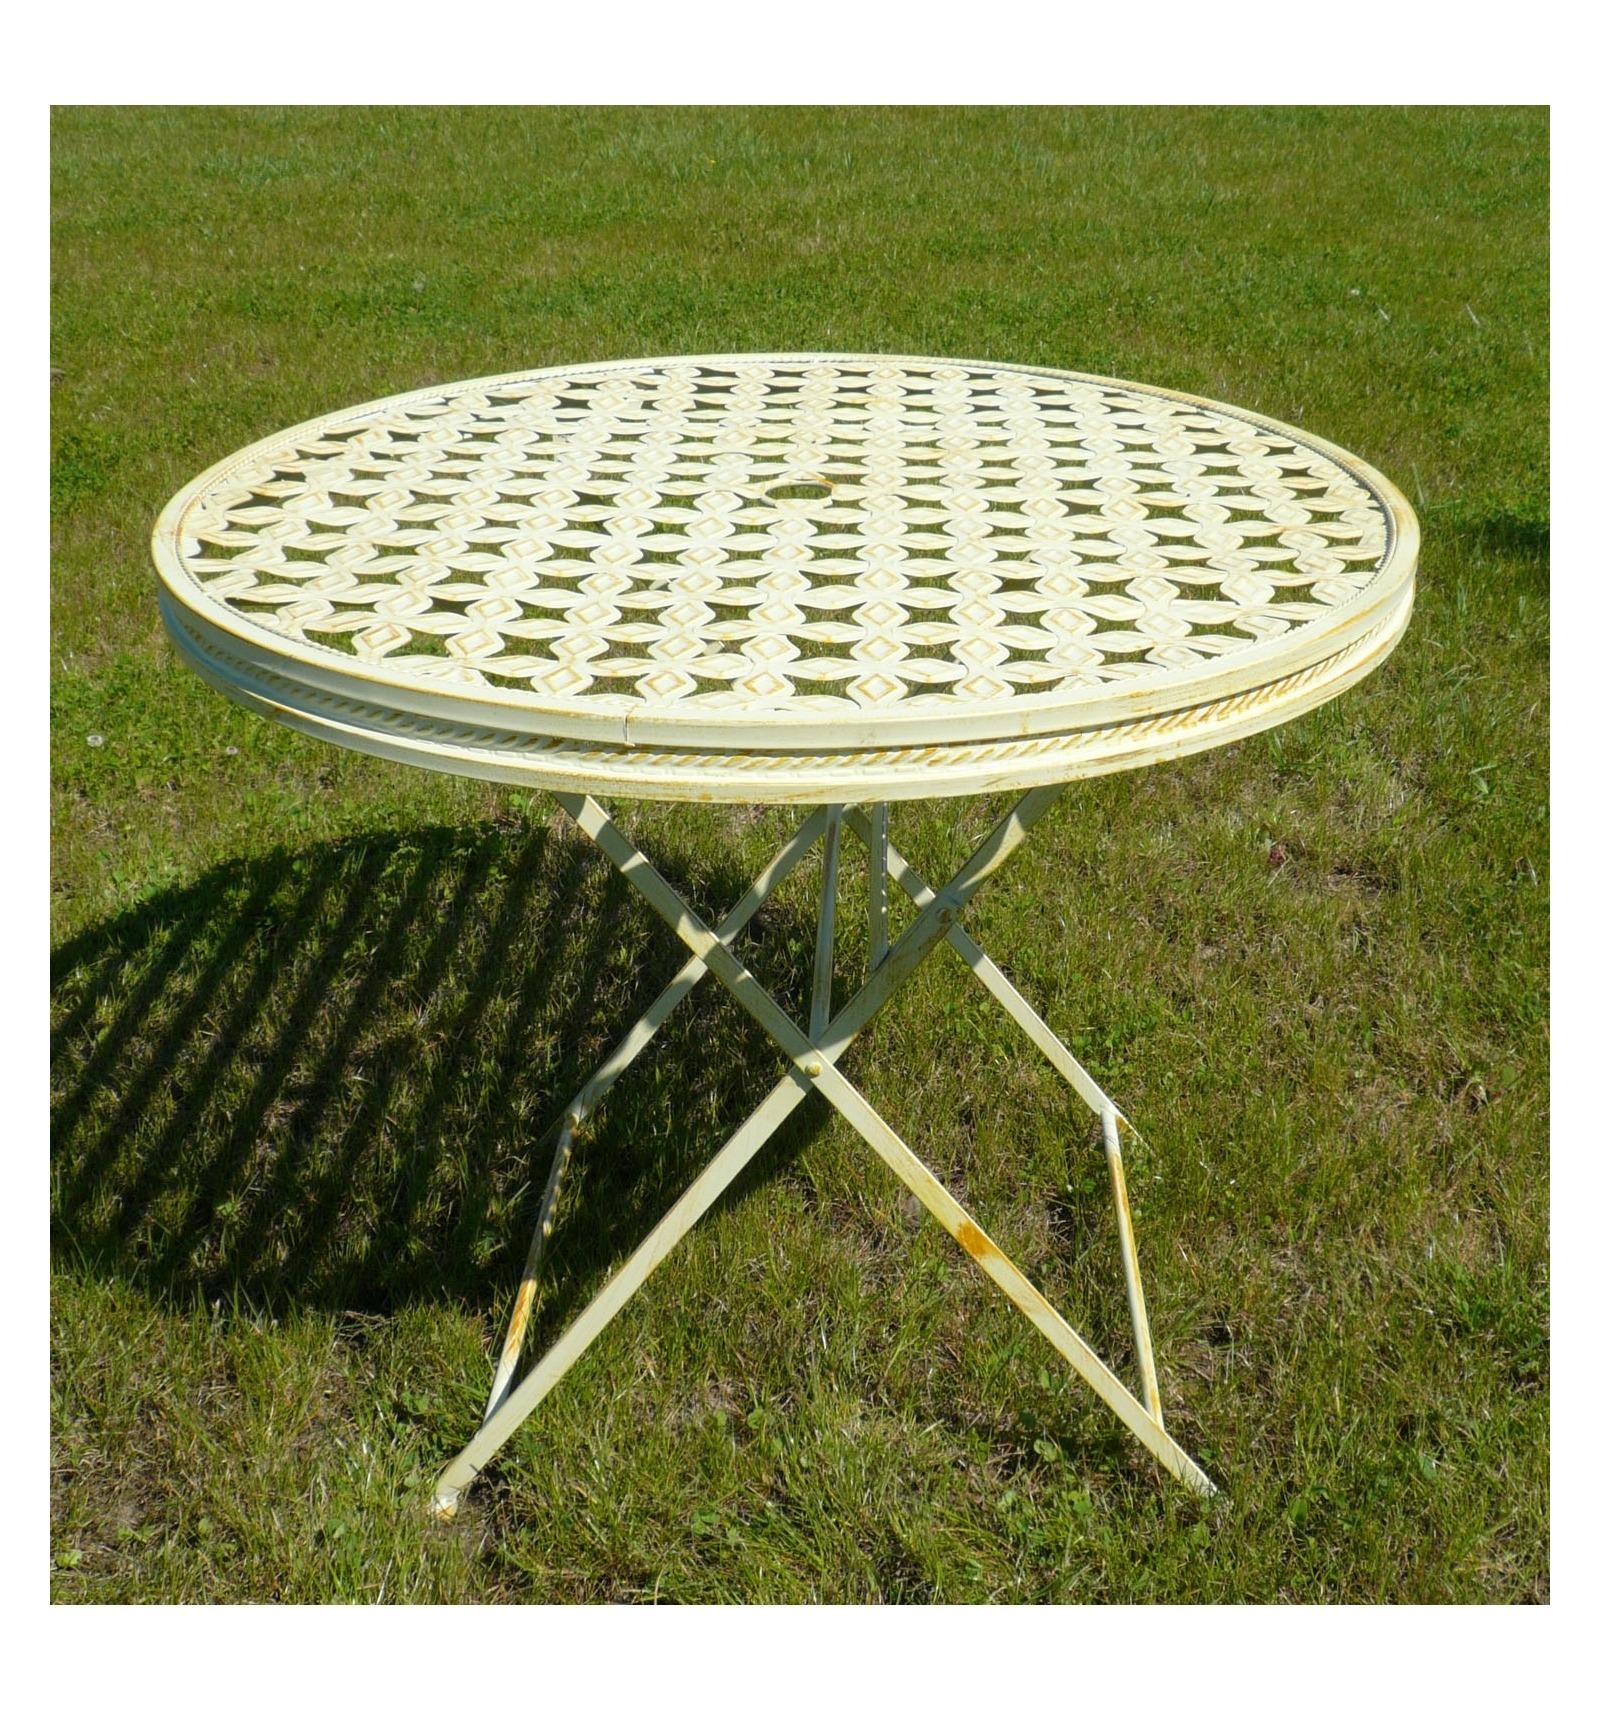 Salon de jardin en fer forg avec une table ronde et 4 chaises for Salon de jardin fer forge